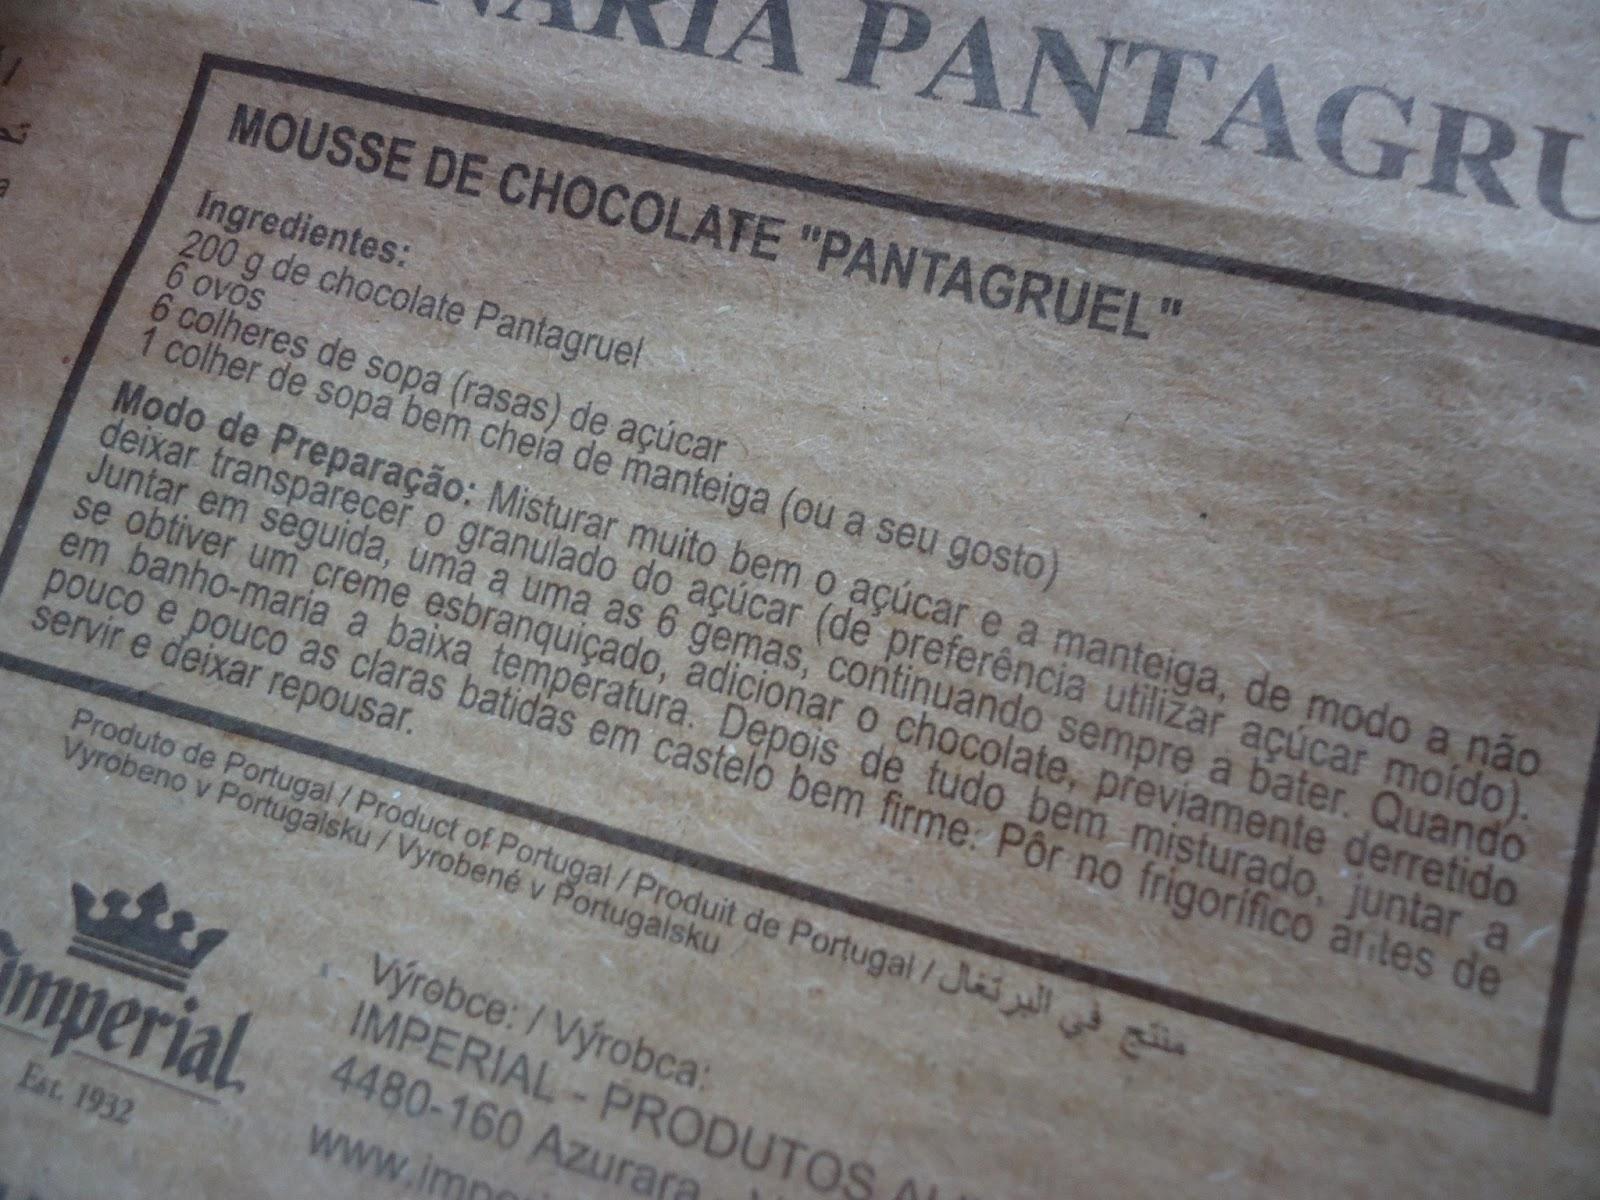 PANTAGRUEL RECEITAS DOWNLOAD